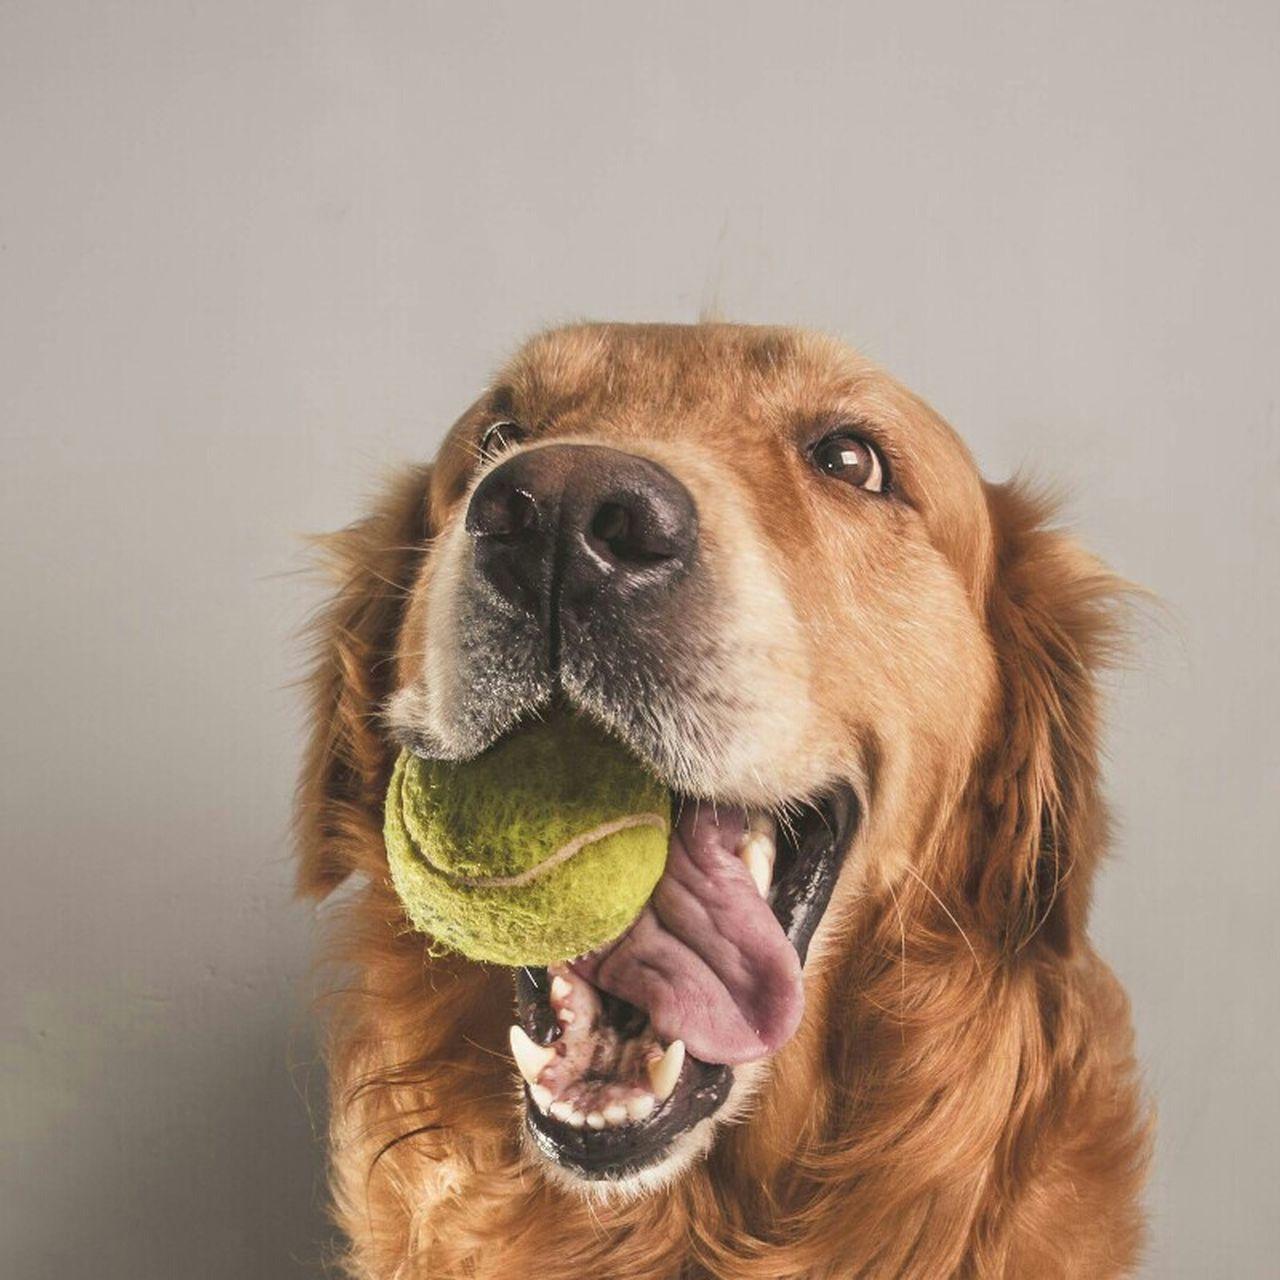 Beautiful stock photos of ostern, pets, domestic animals, dog, one animal